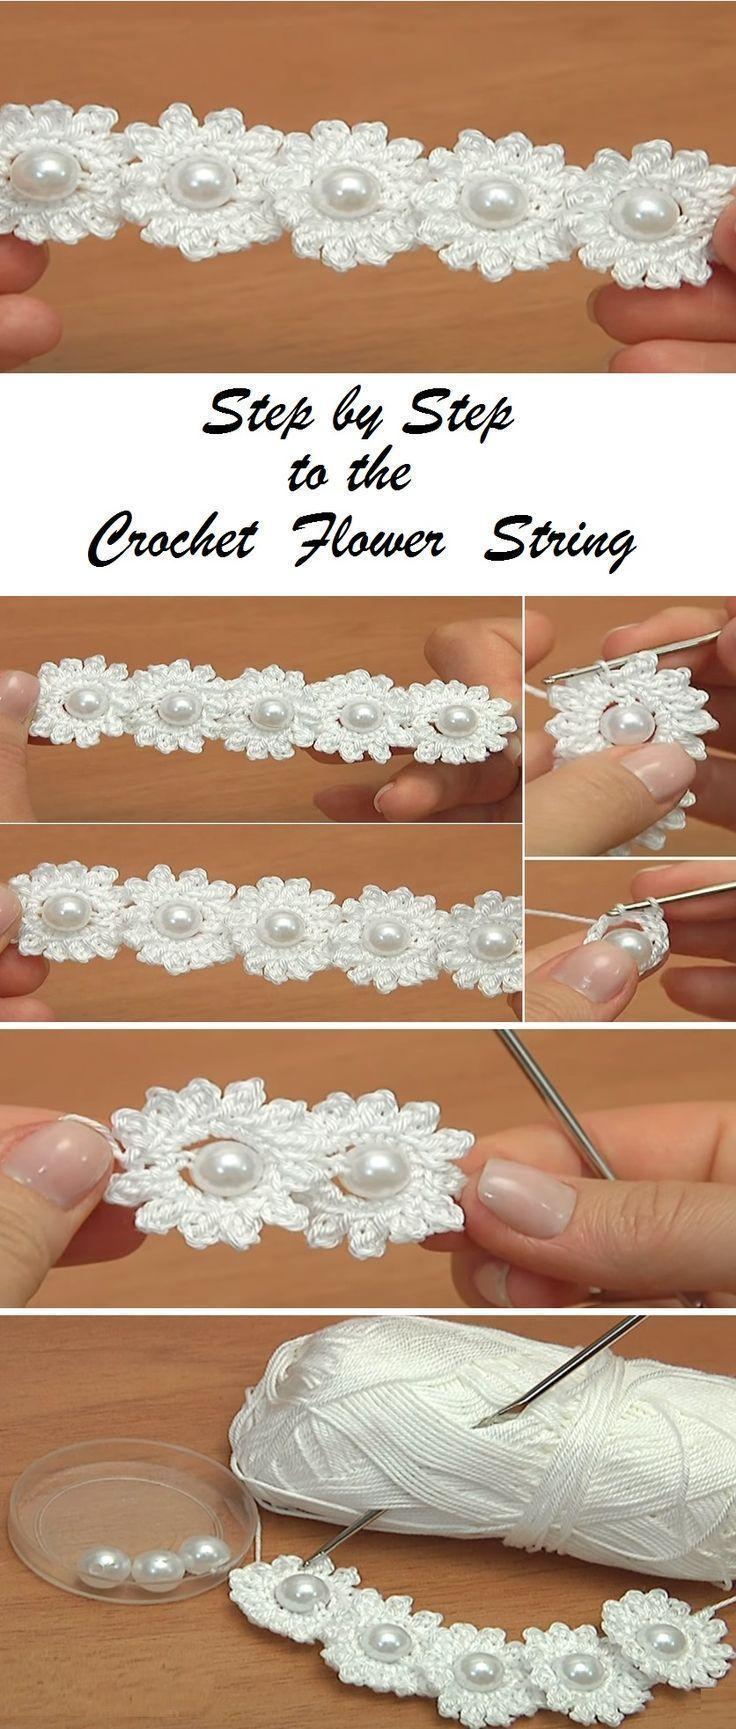 Crochet Mini Flower String  Šitie pletenieháčkovanie  Pinterest